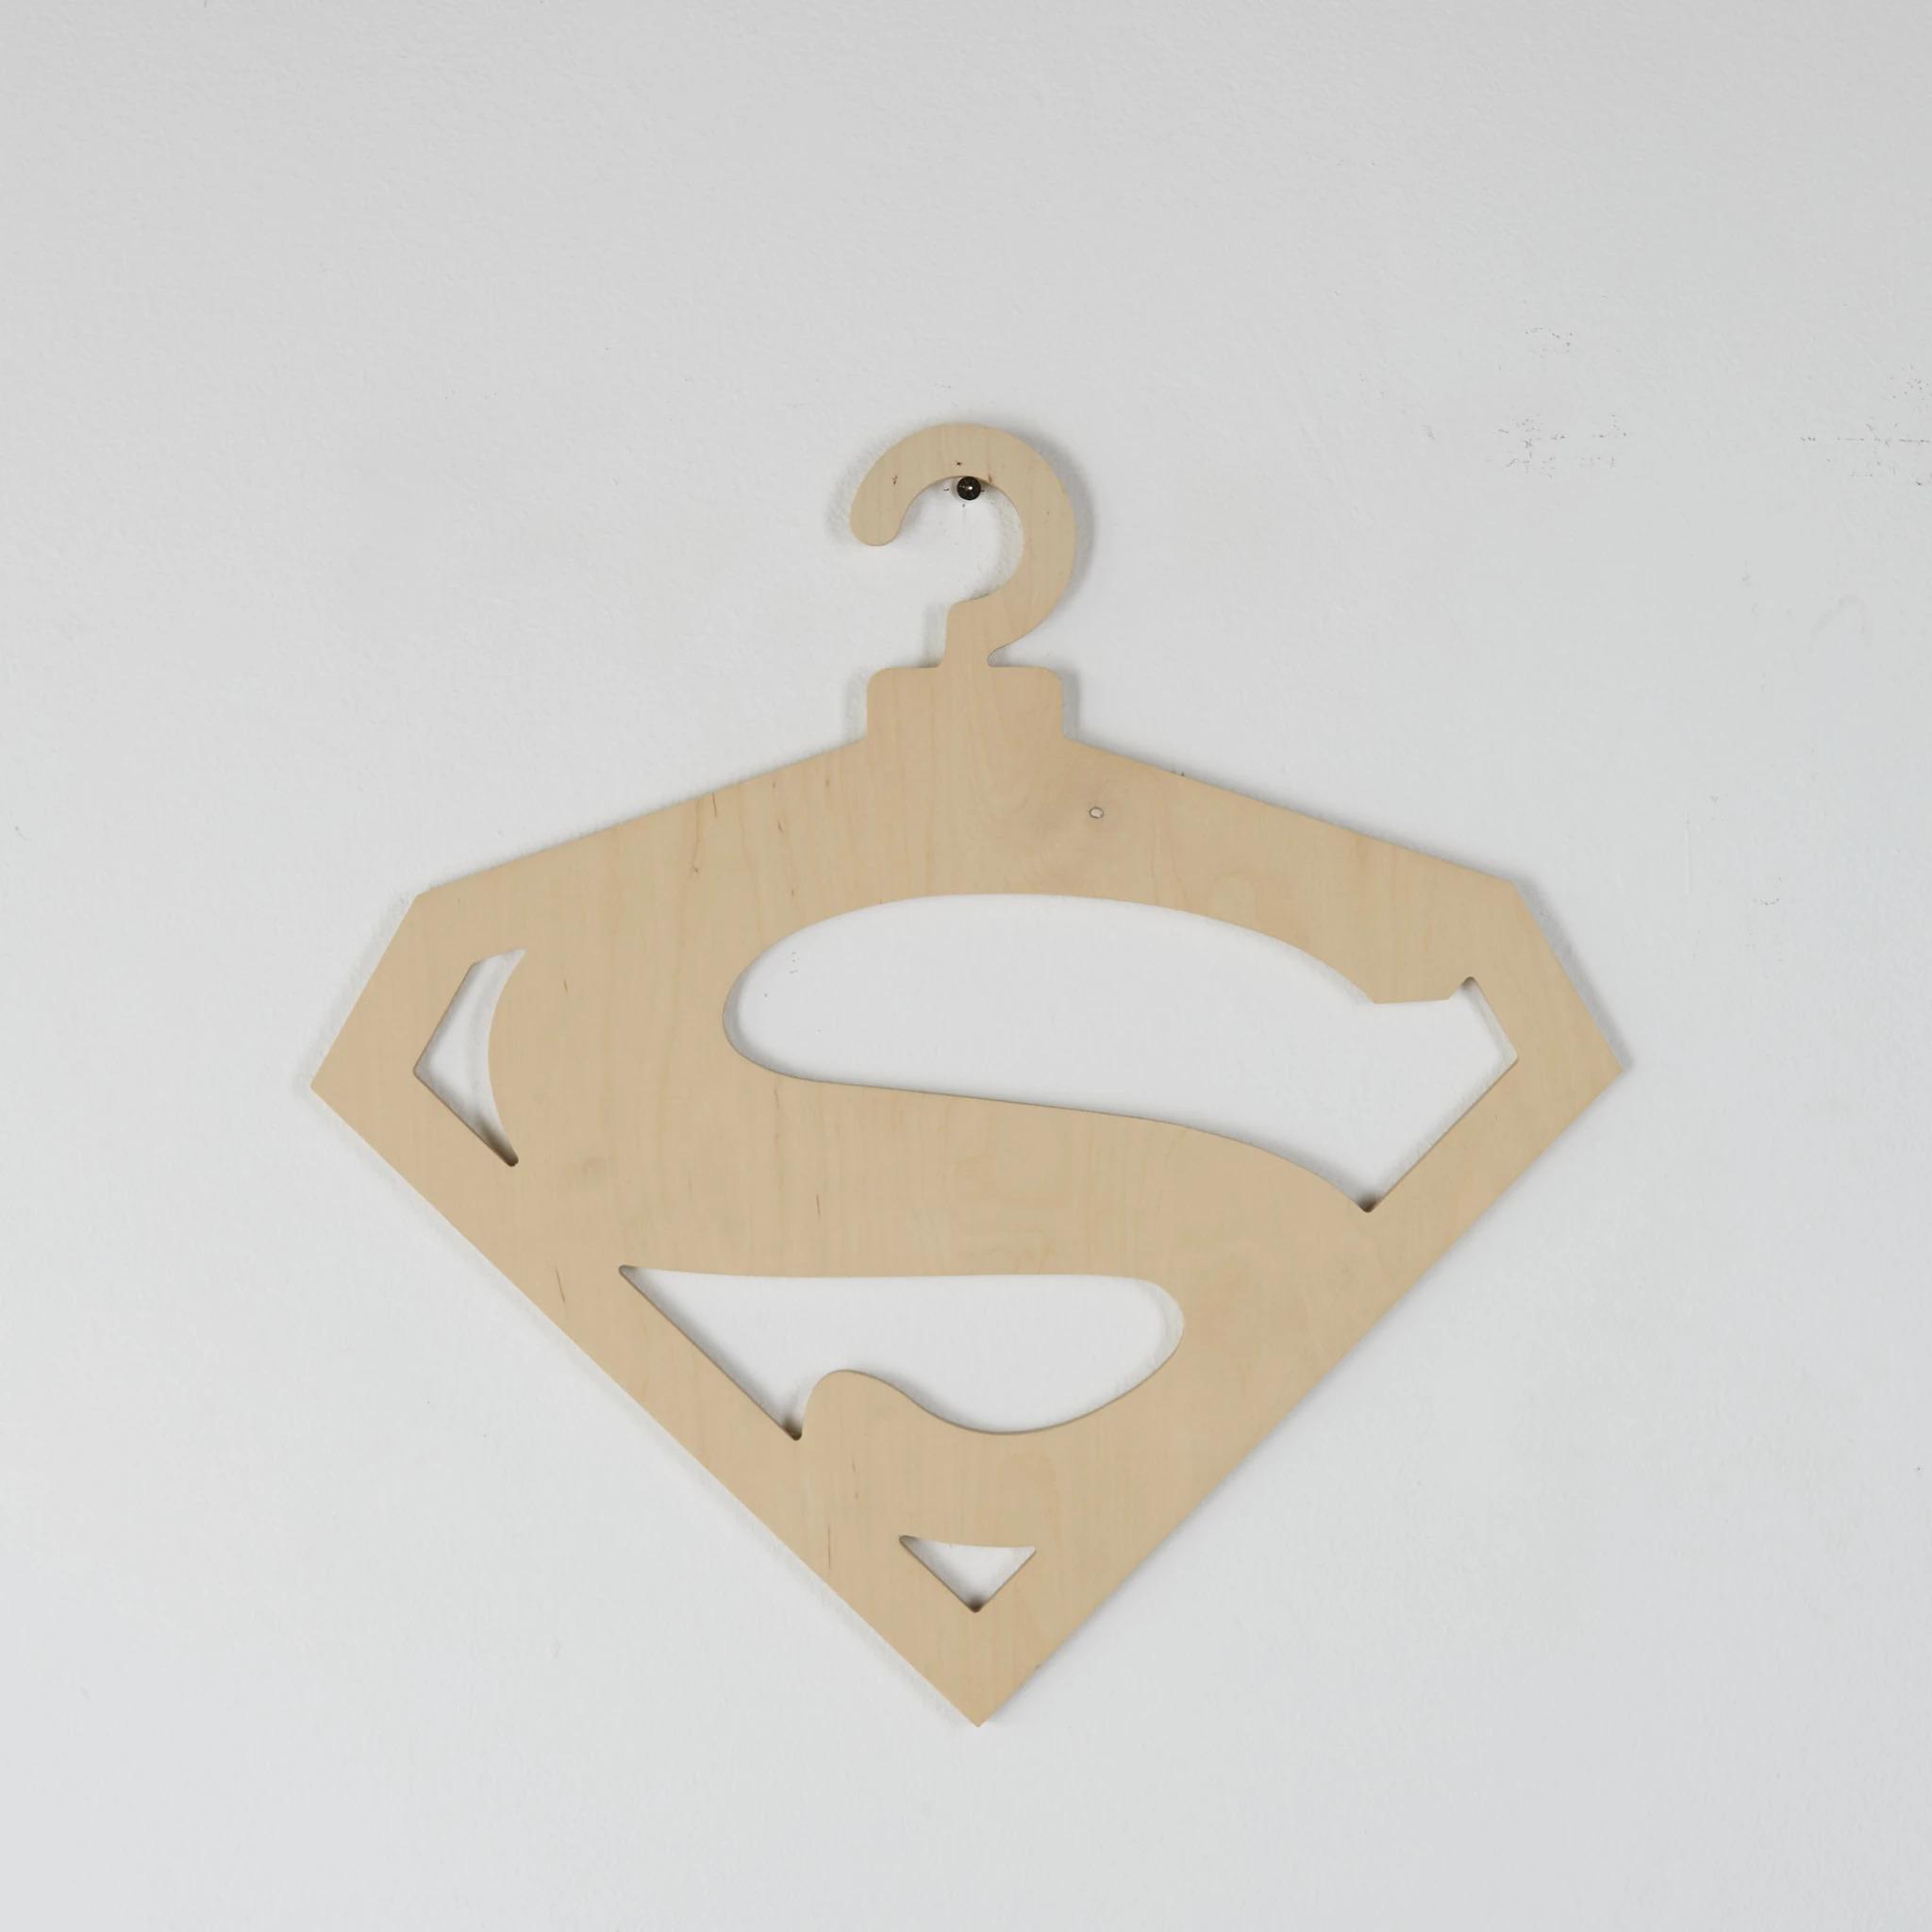 Laser Cut Superman Hanger Free CDR Vectors Art